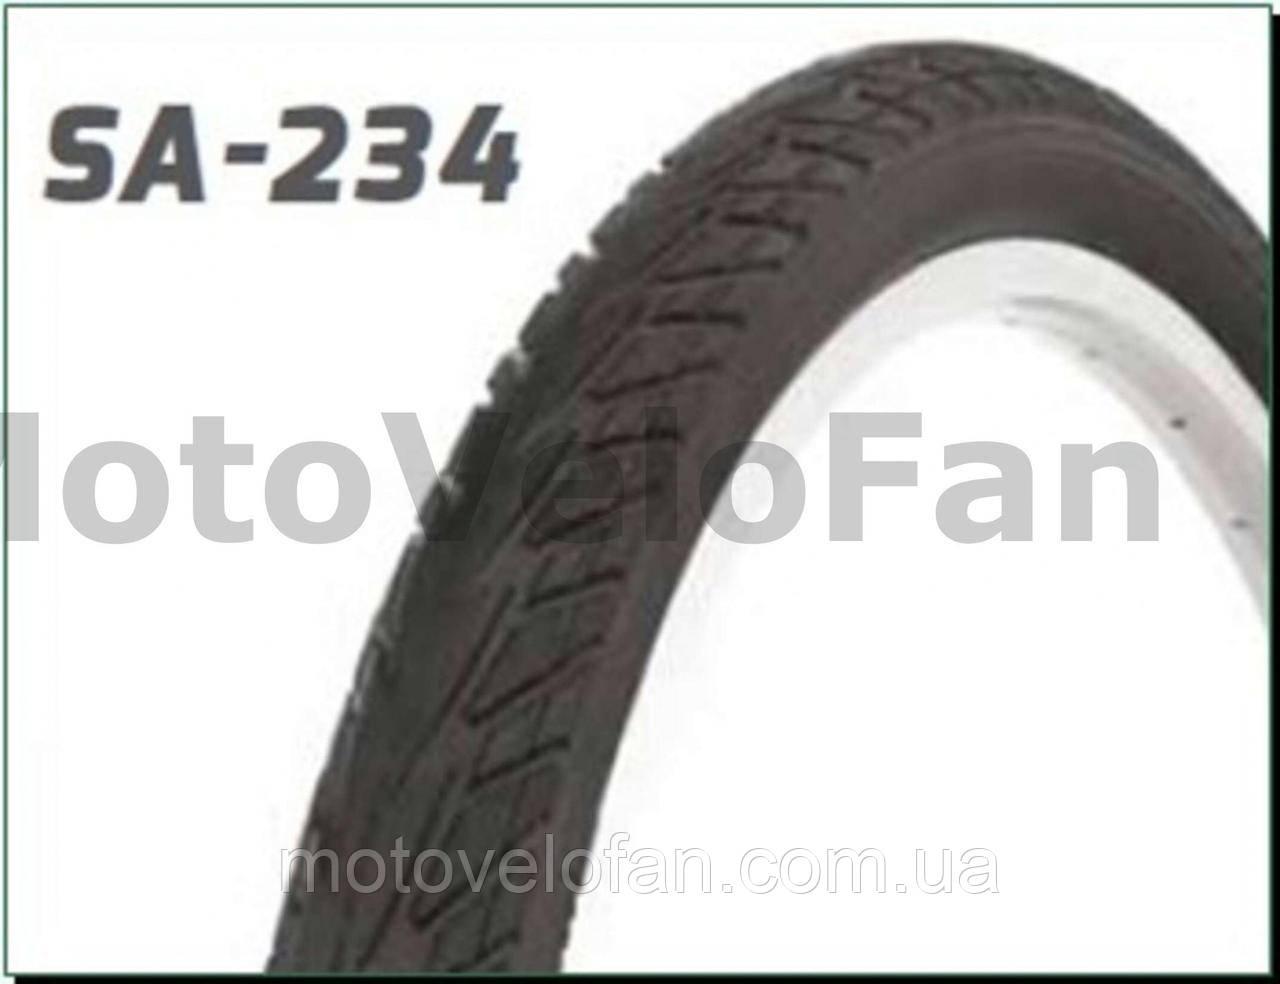 Велосипедная шина   28 * 1,40   (700 * 35C) (37-622)   (S-234 Blue strip)   Delitire-Индонезия   (#LTK)